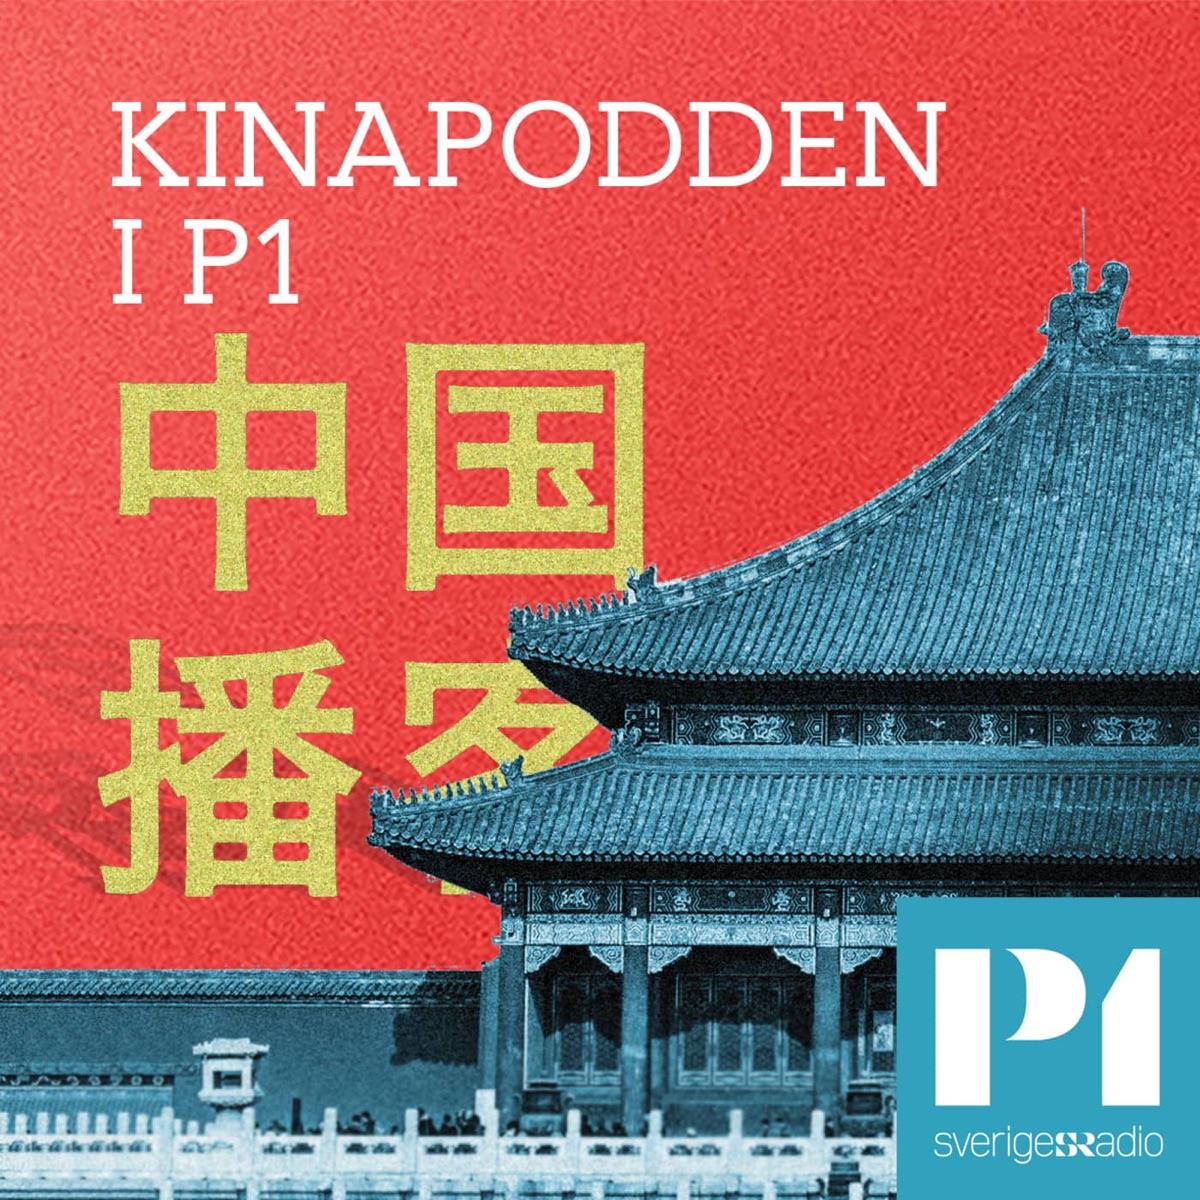 Kinapodden i P1